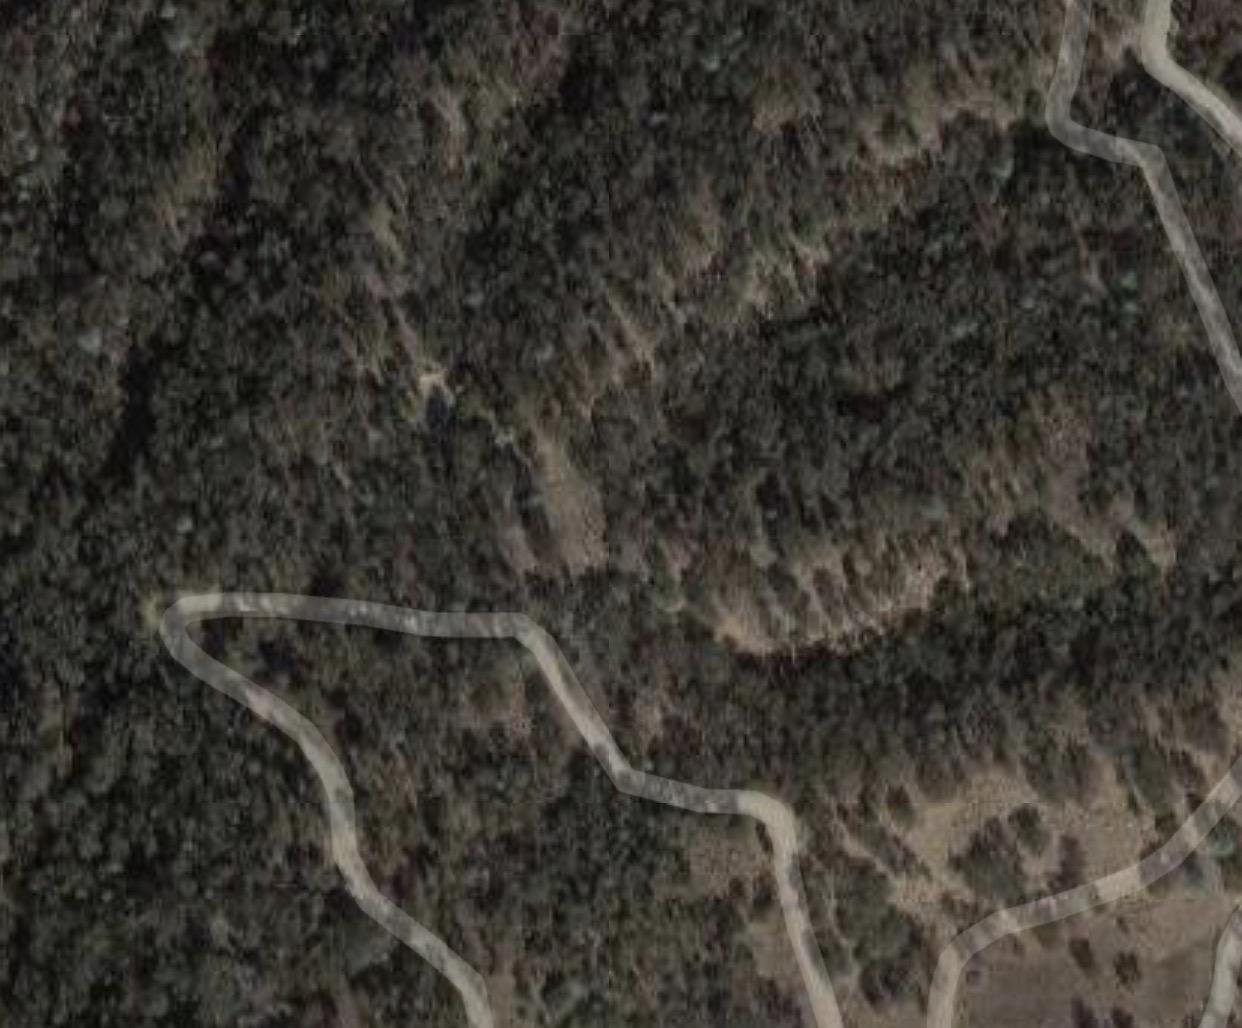 أراضي للـ Sale في N/A Mines Road N/A Mines Road Livermore, California 94550 United States